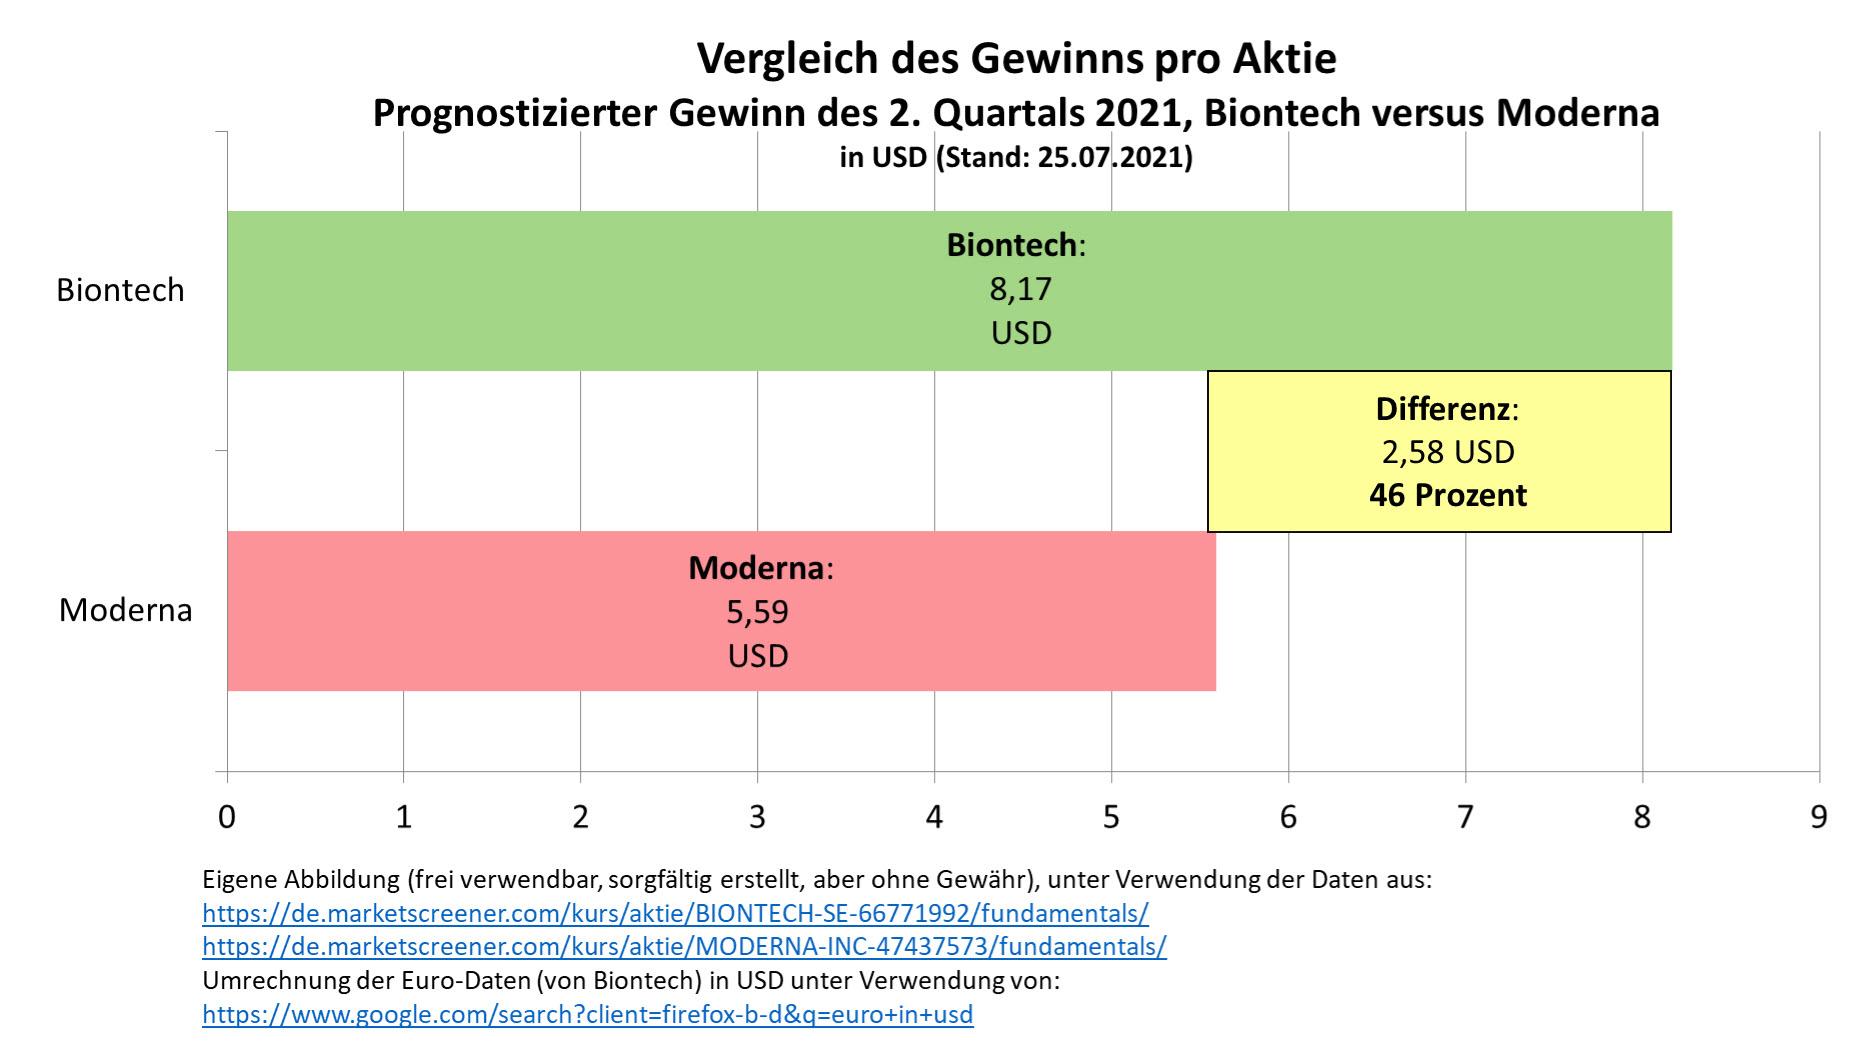 vergleich_gewinn_pro_aktie_q2_biontech_moder....jpg